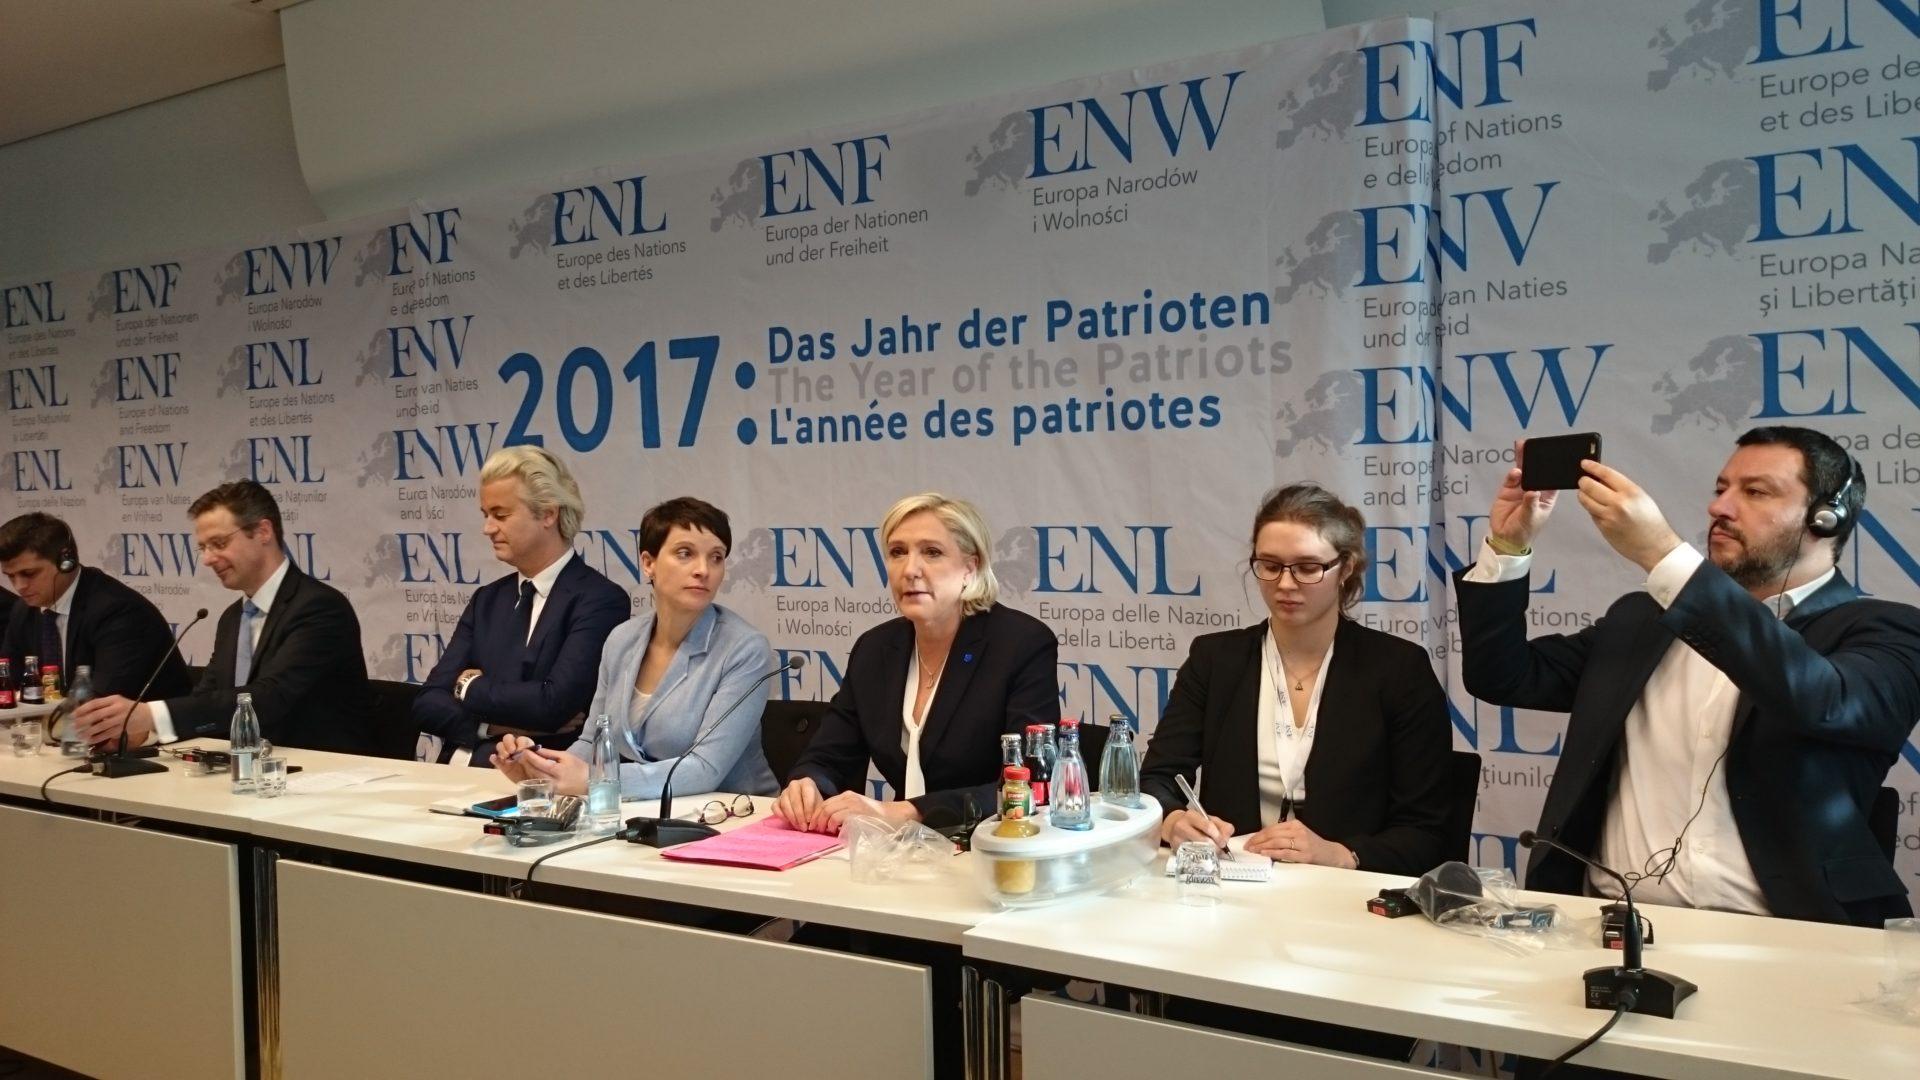 Regard de Frauke Petry en direction de Marine Le Pen.